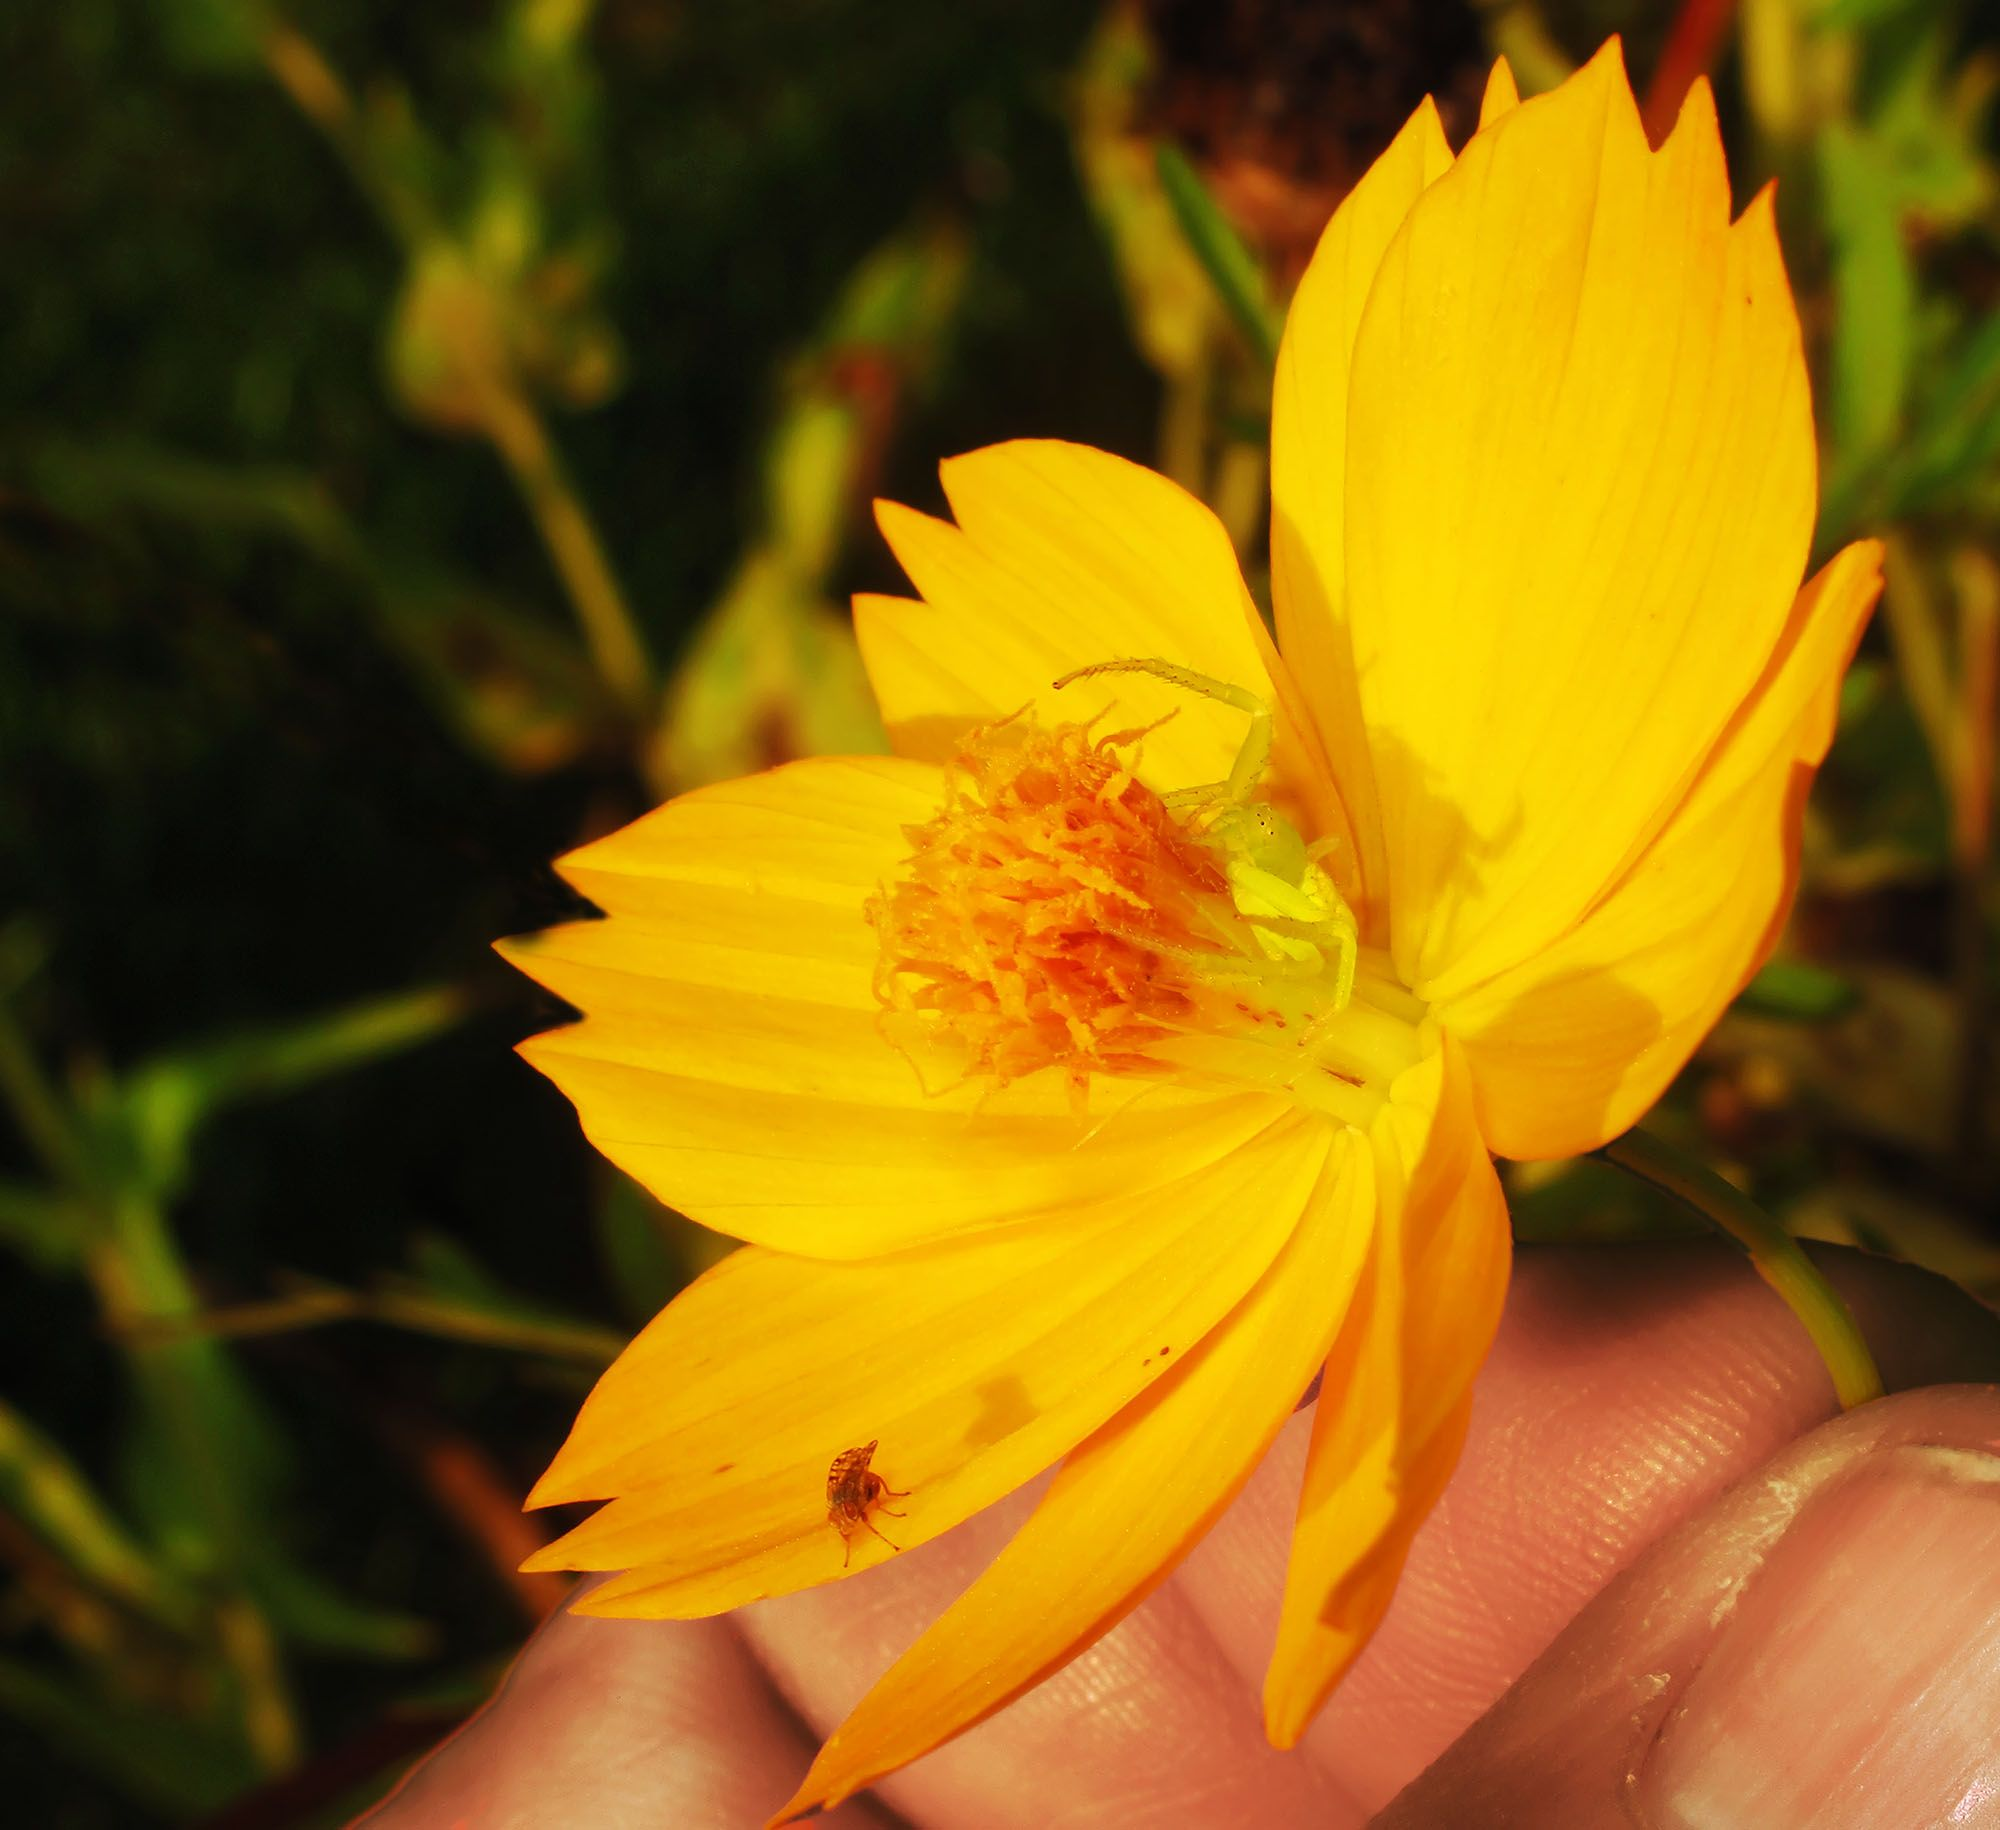 Displaying 17 images for yellow jasmine flower tattoo yellow displaying images for yellow jasmine flower tattoo izmirmasajfo Images